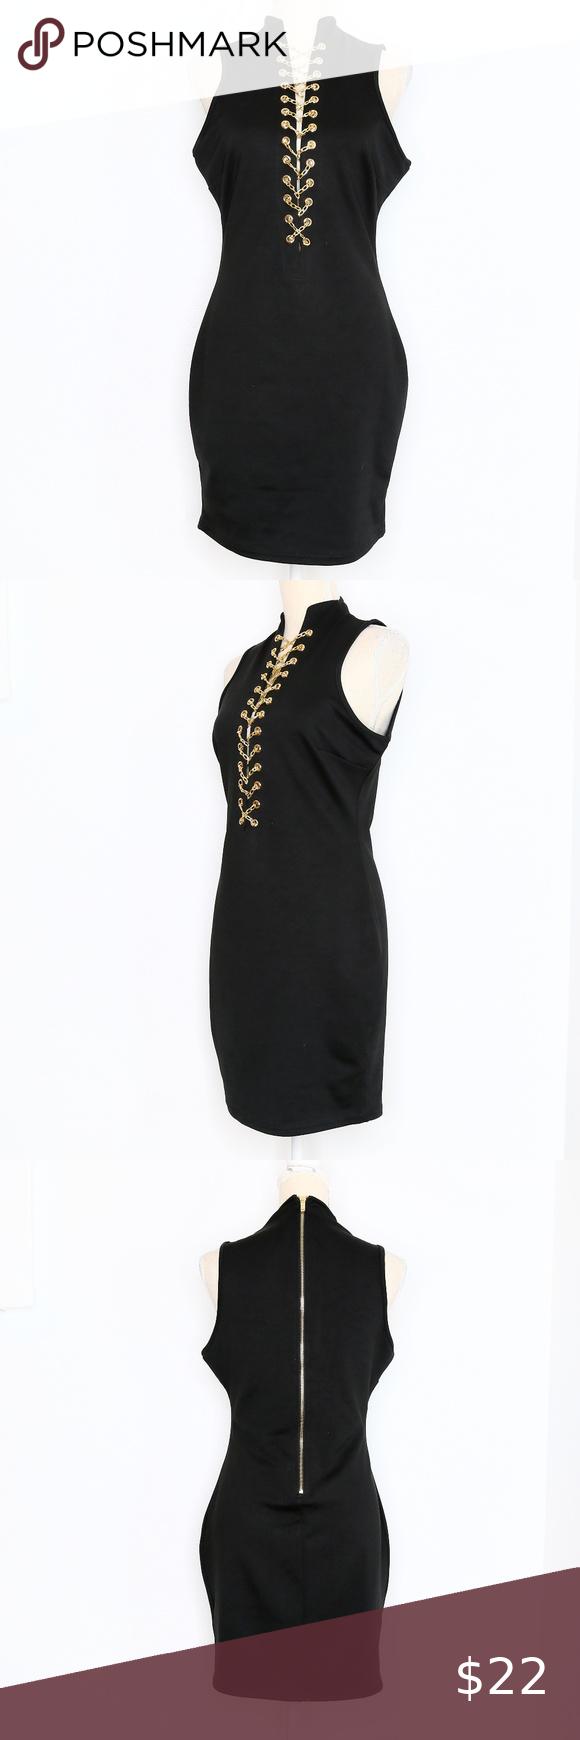 Black High Neck Mini Dress Gold Chain Cross Front High Neck Mini Dress High Neck Black Dress Gold Dress [ 1740 x 580 Pixel ]